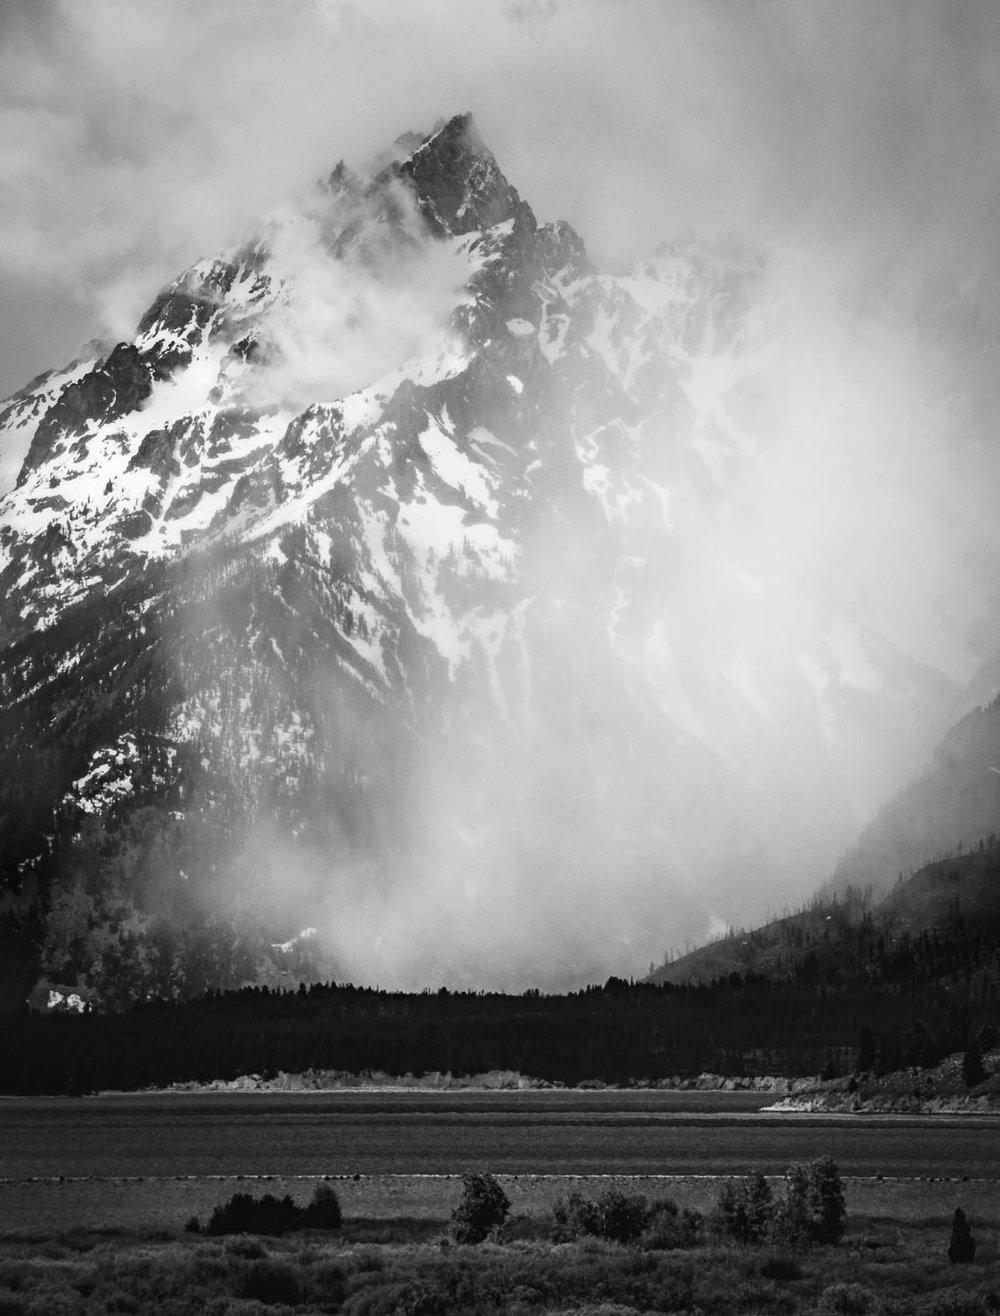 Mountain Virga